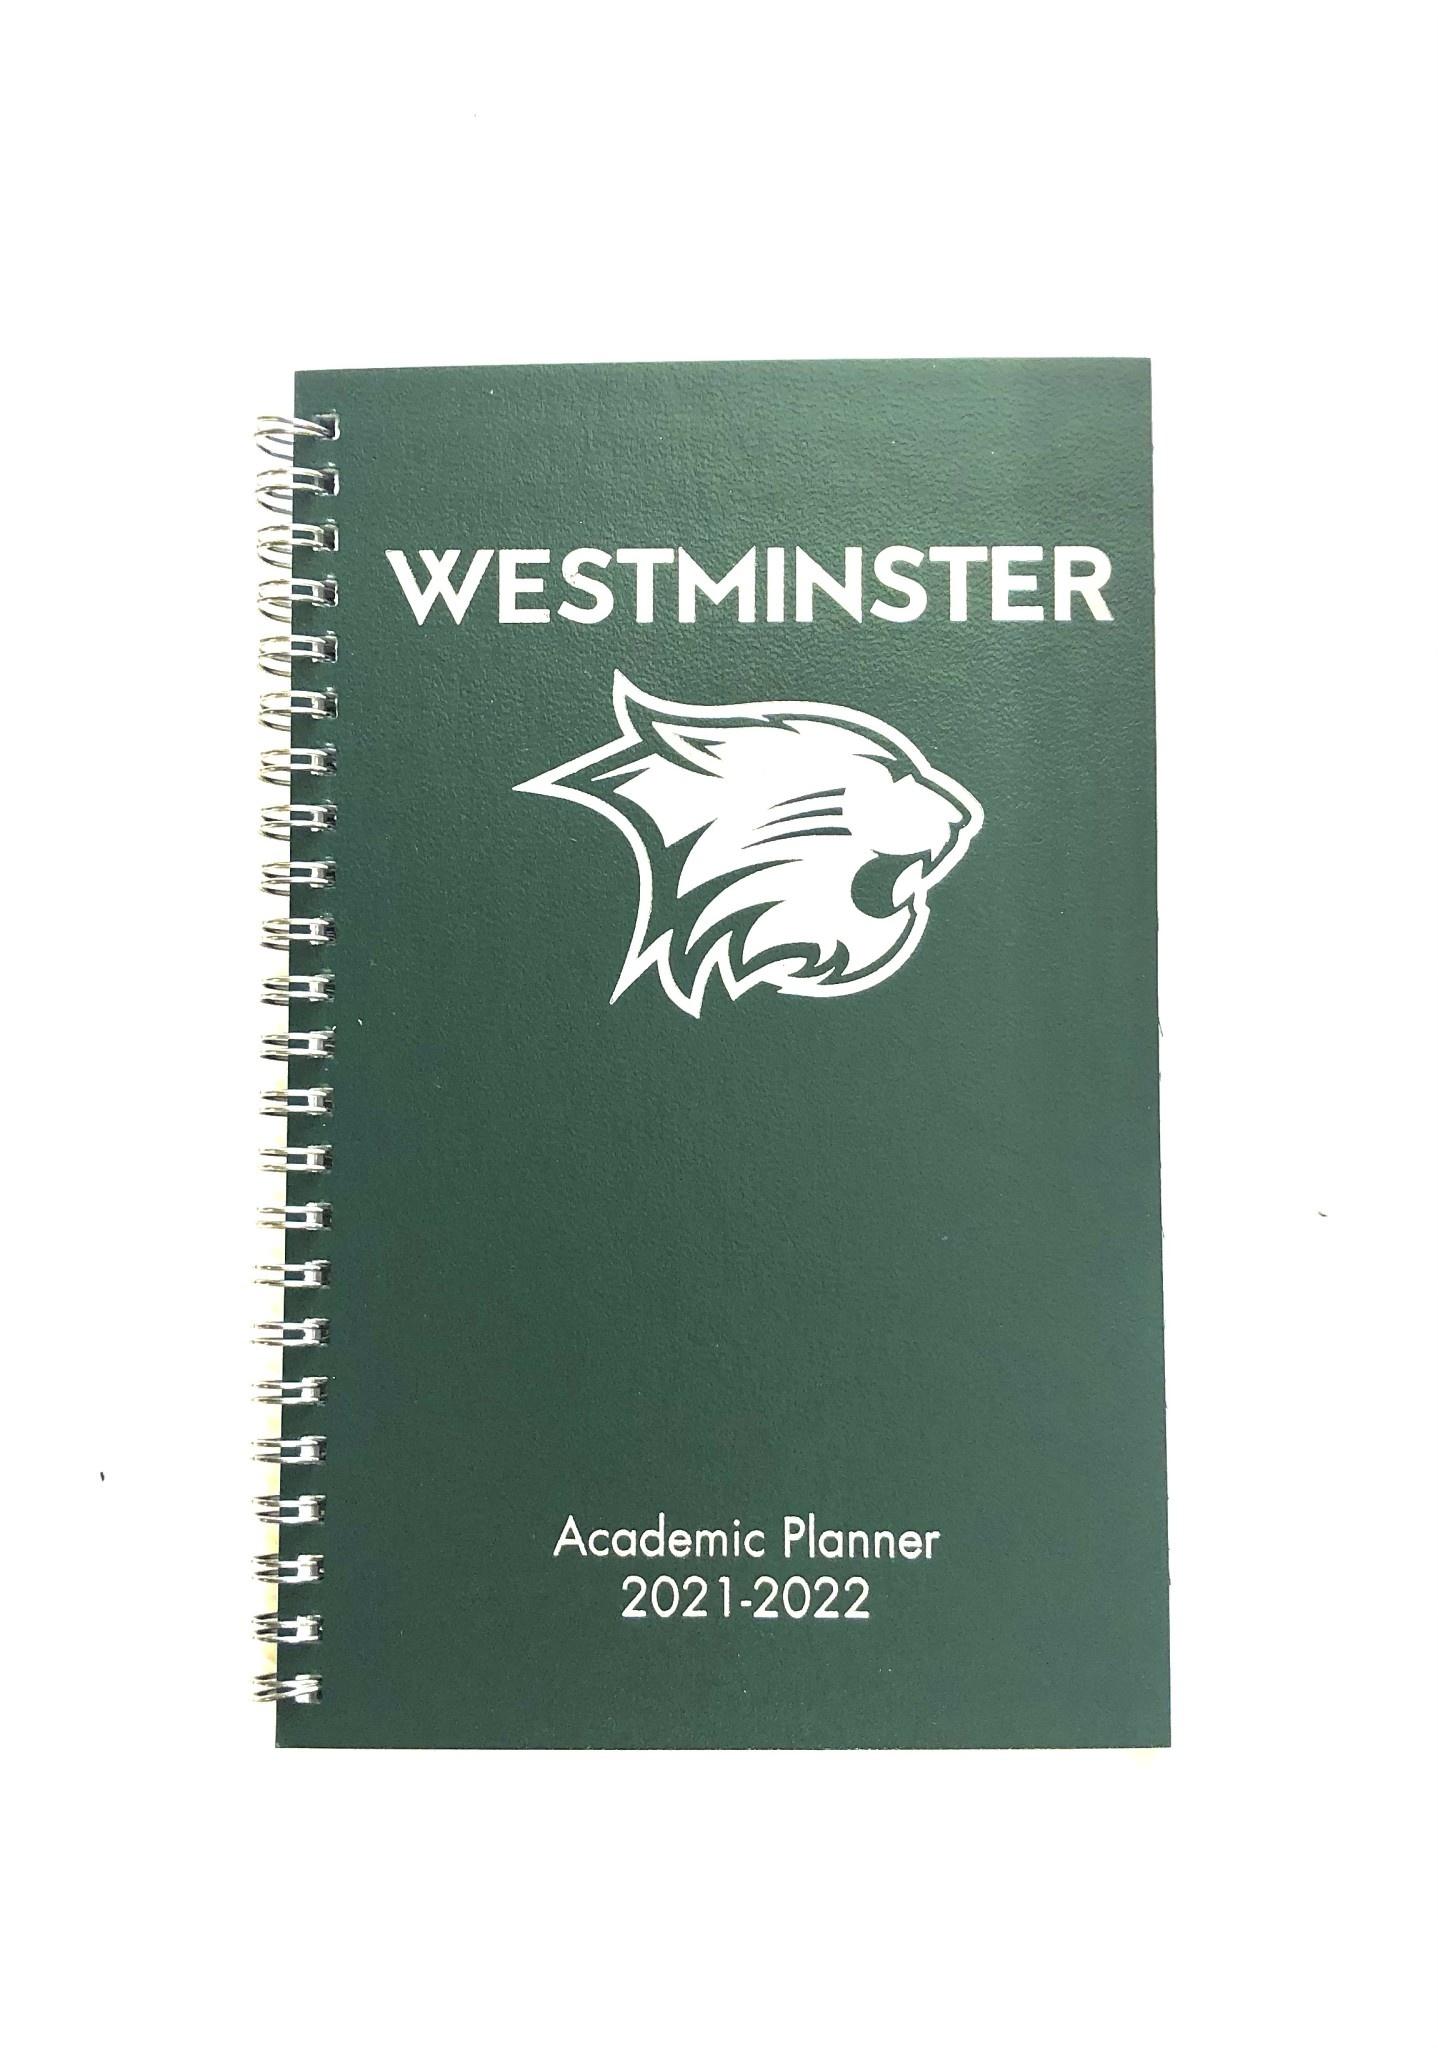 Academic Planner: Westminster 2021-2022